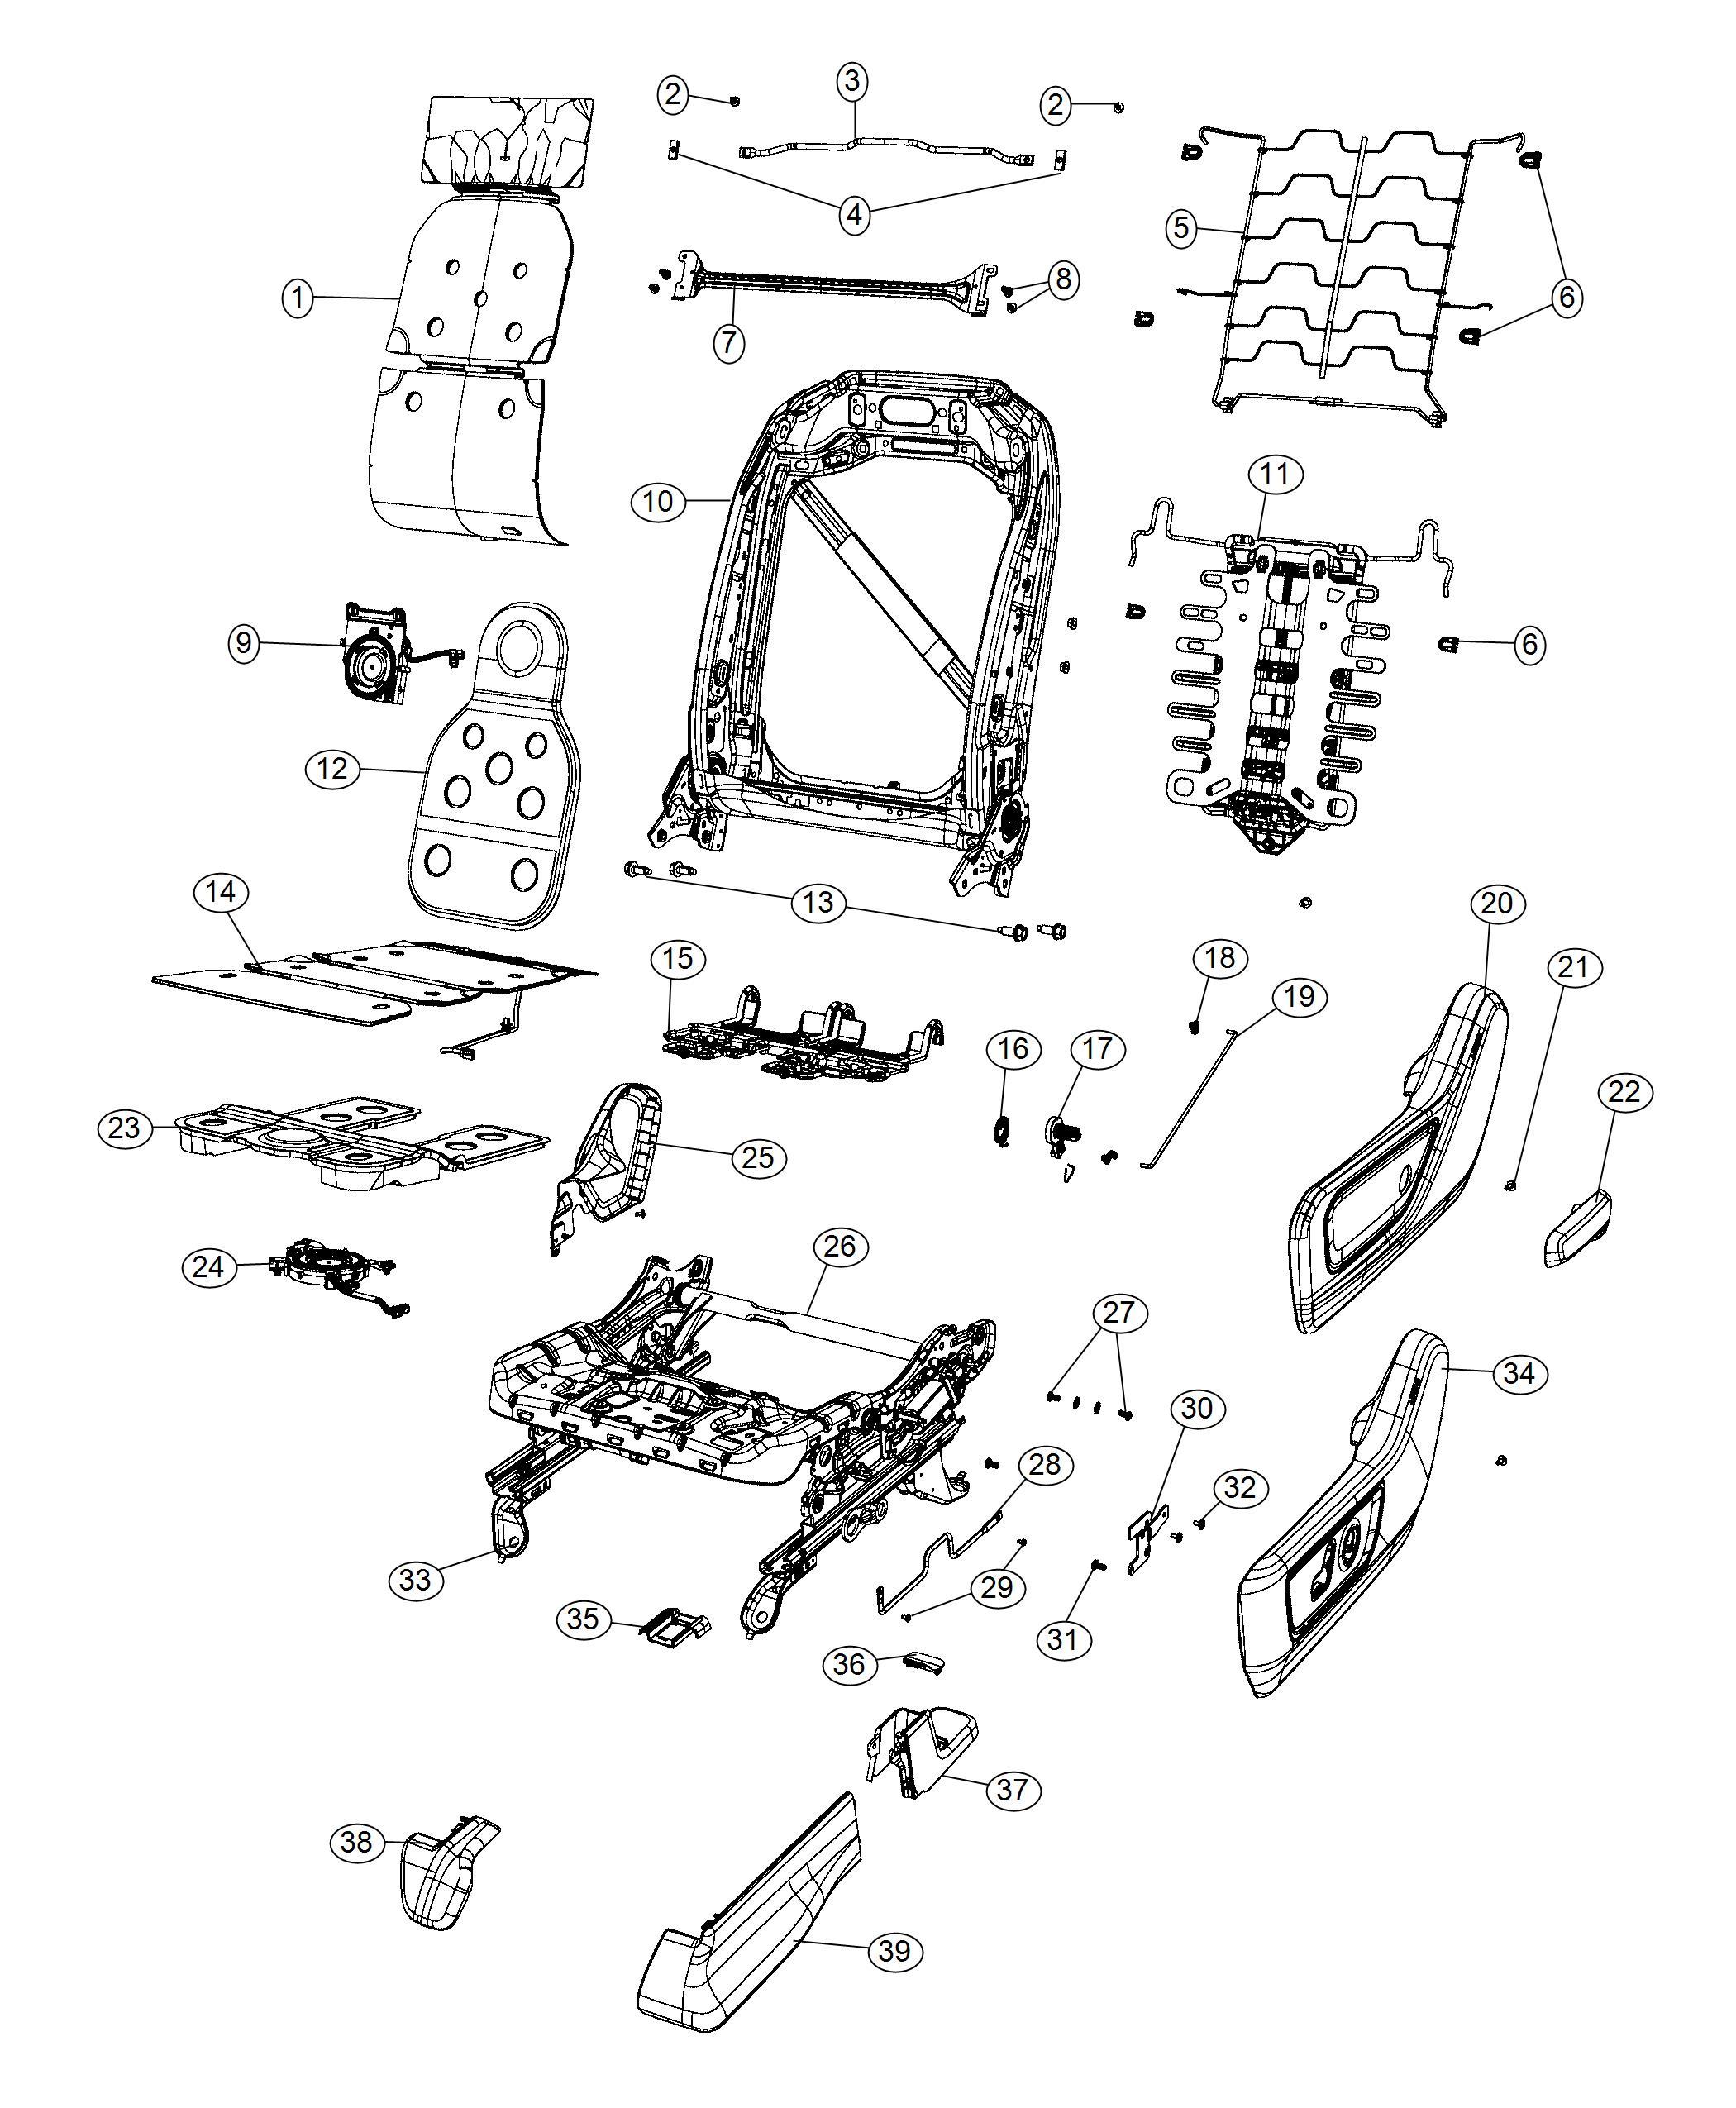 Ram 1500 Screw. M10x1.5x28.0, m10x1.5x30. Seat, folding